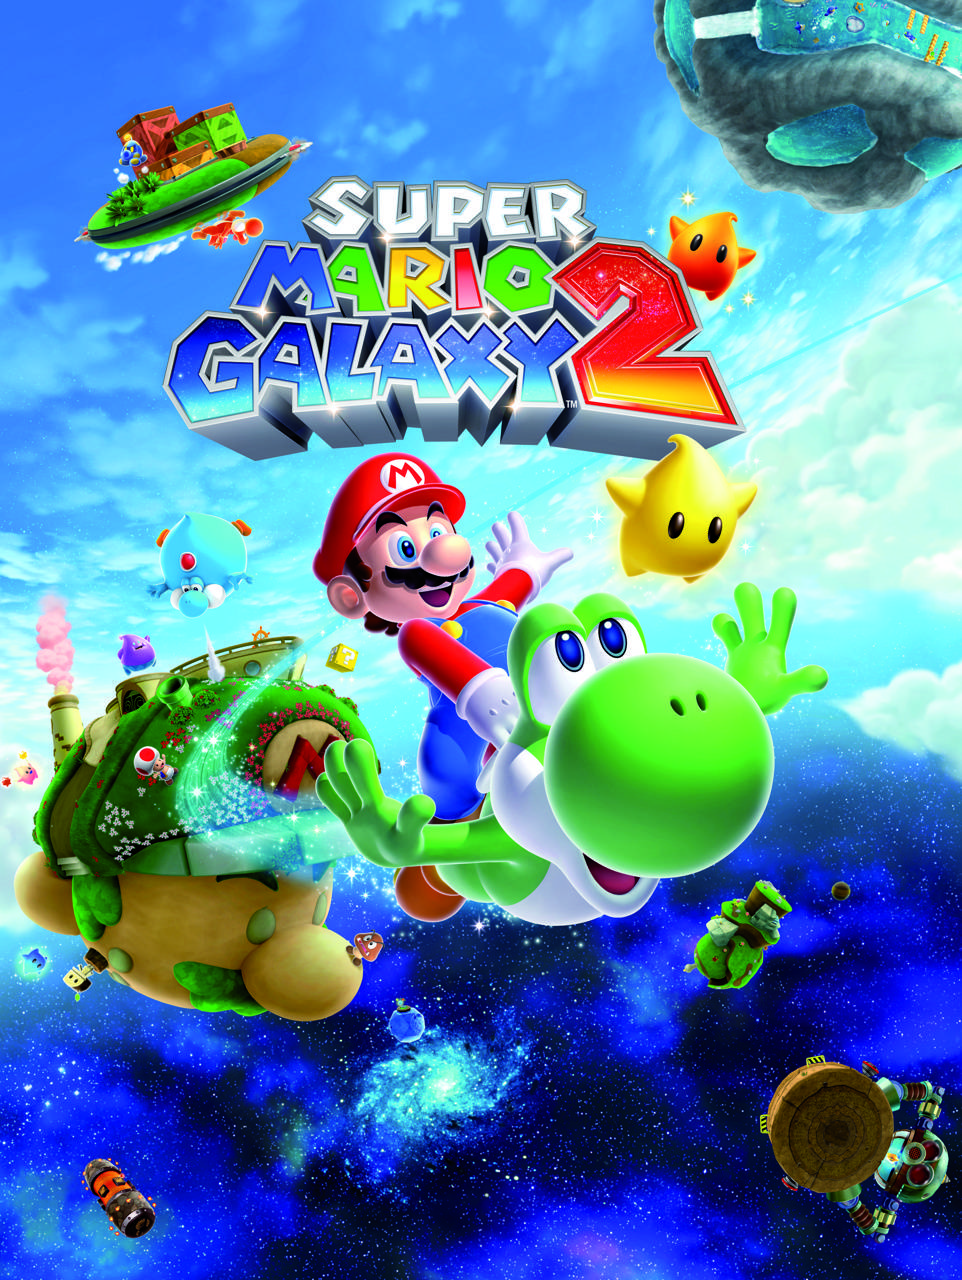 Super Mario Galaxy 2 Wallpaper By Luigyh 2c Free On Zedge